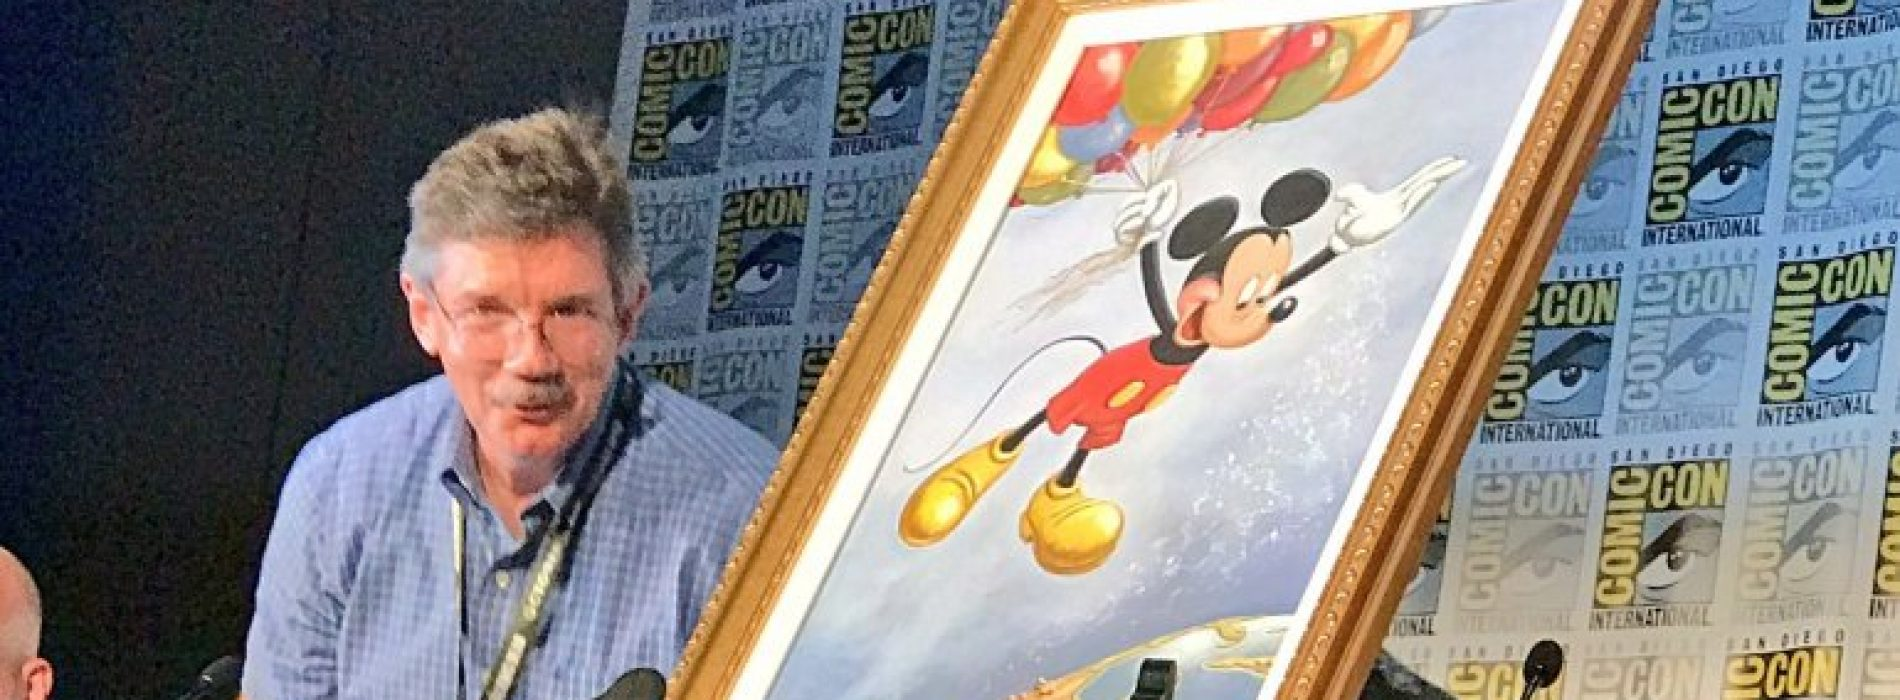 Mickey Mouse celebra su 90º aniversario con un nuevo retrato oficial